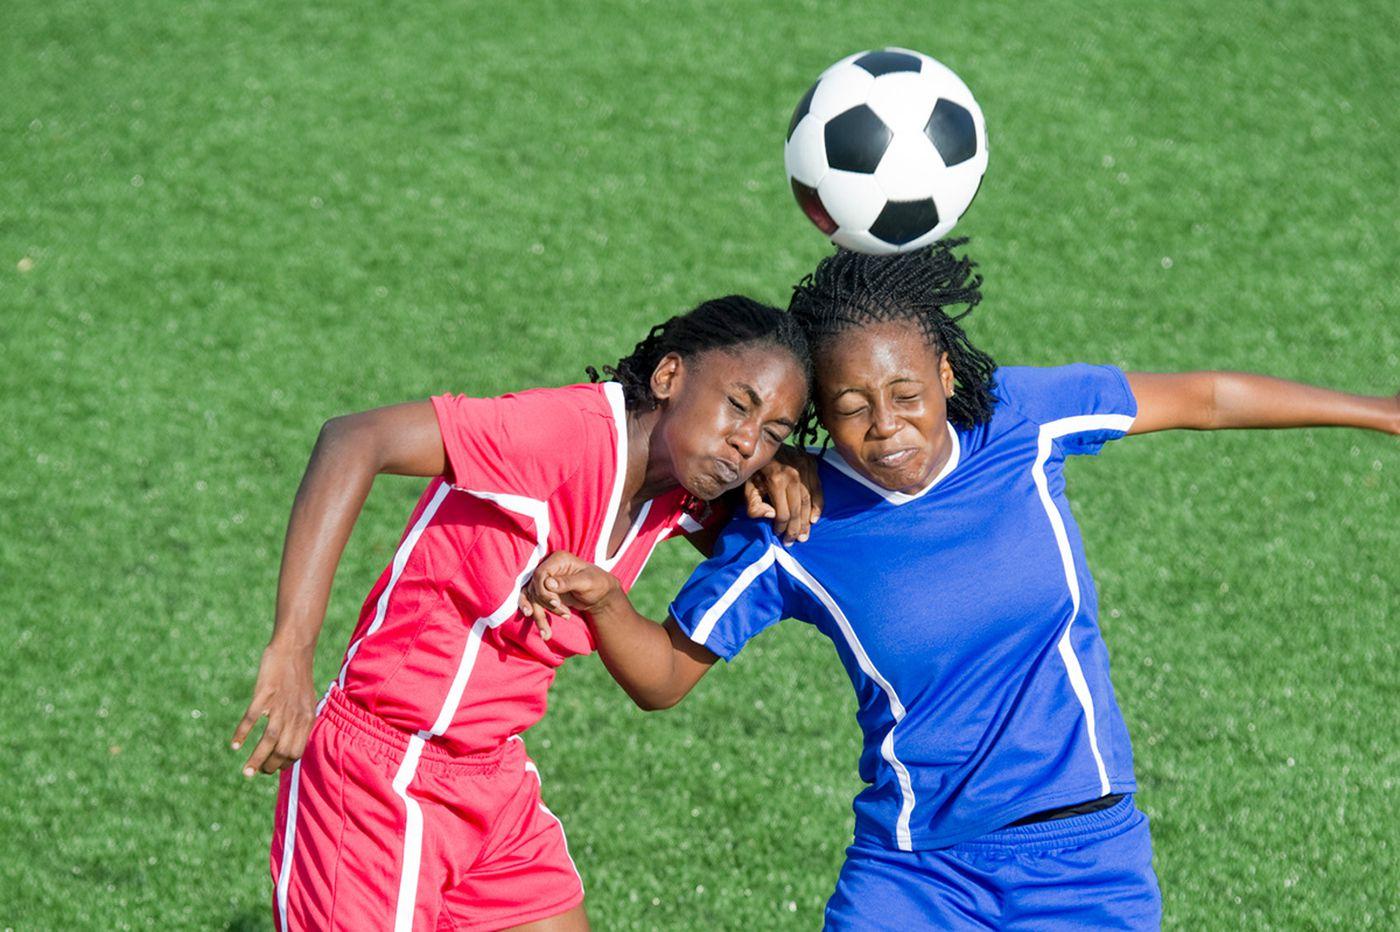 Should kids avoid heading a soccer ball — especially girls?